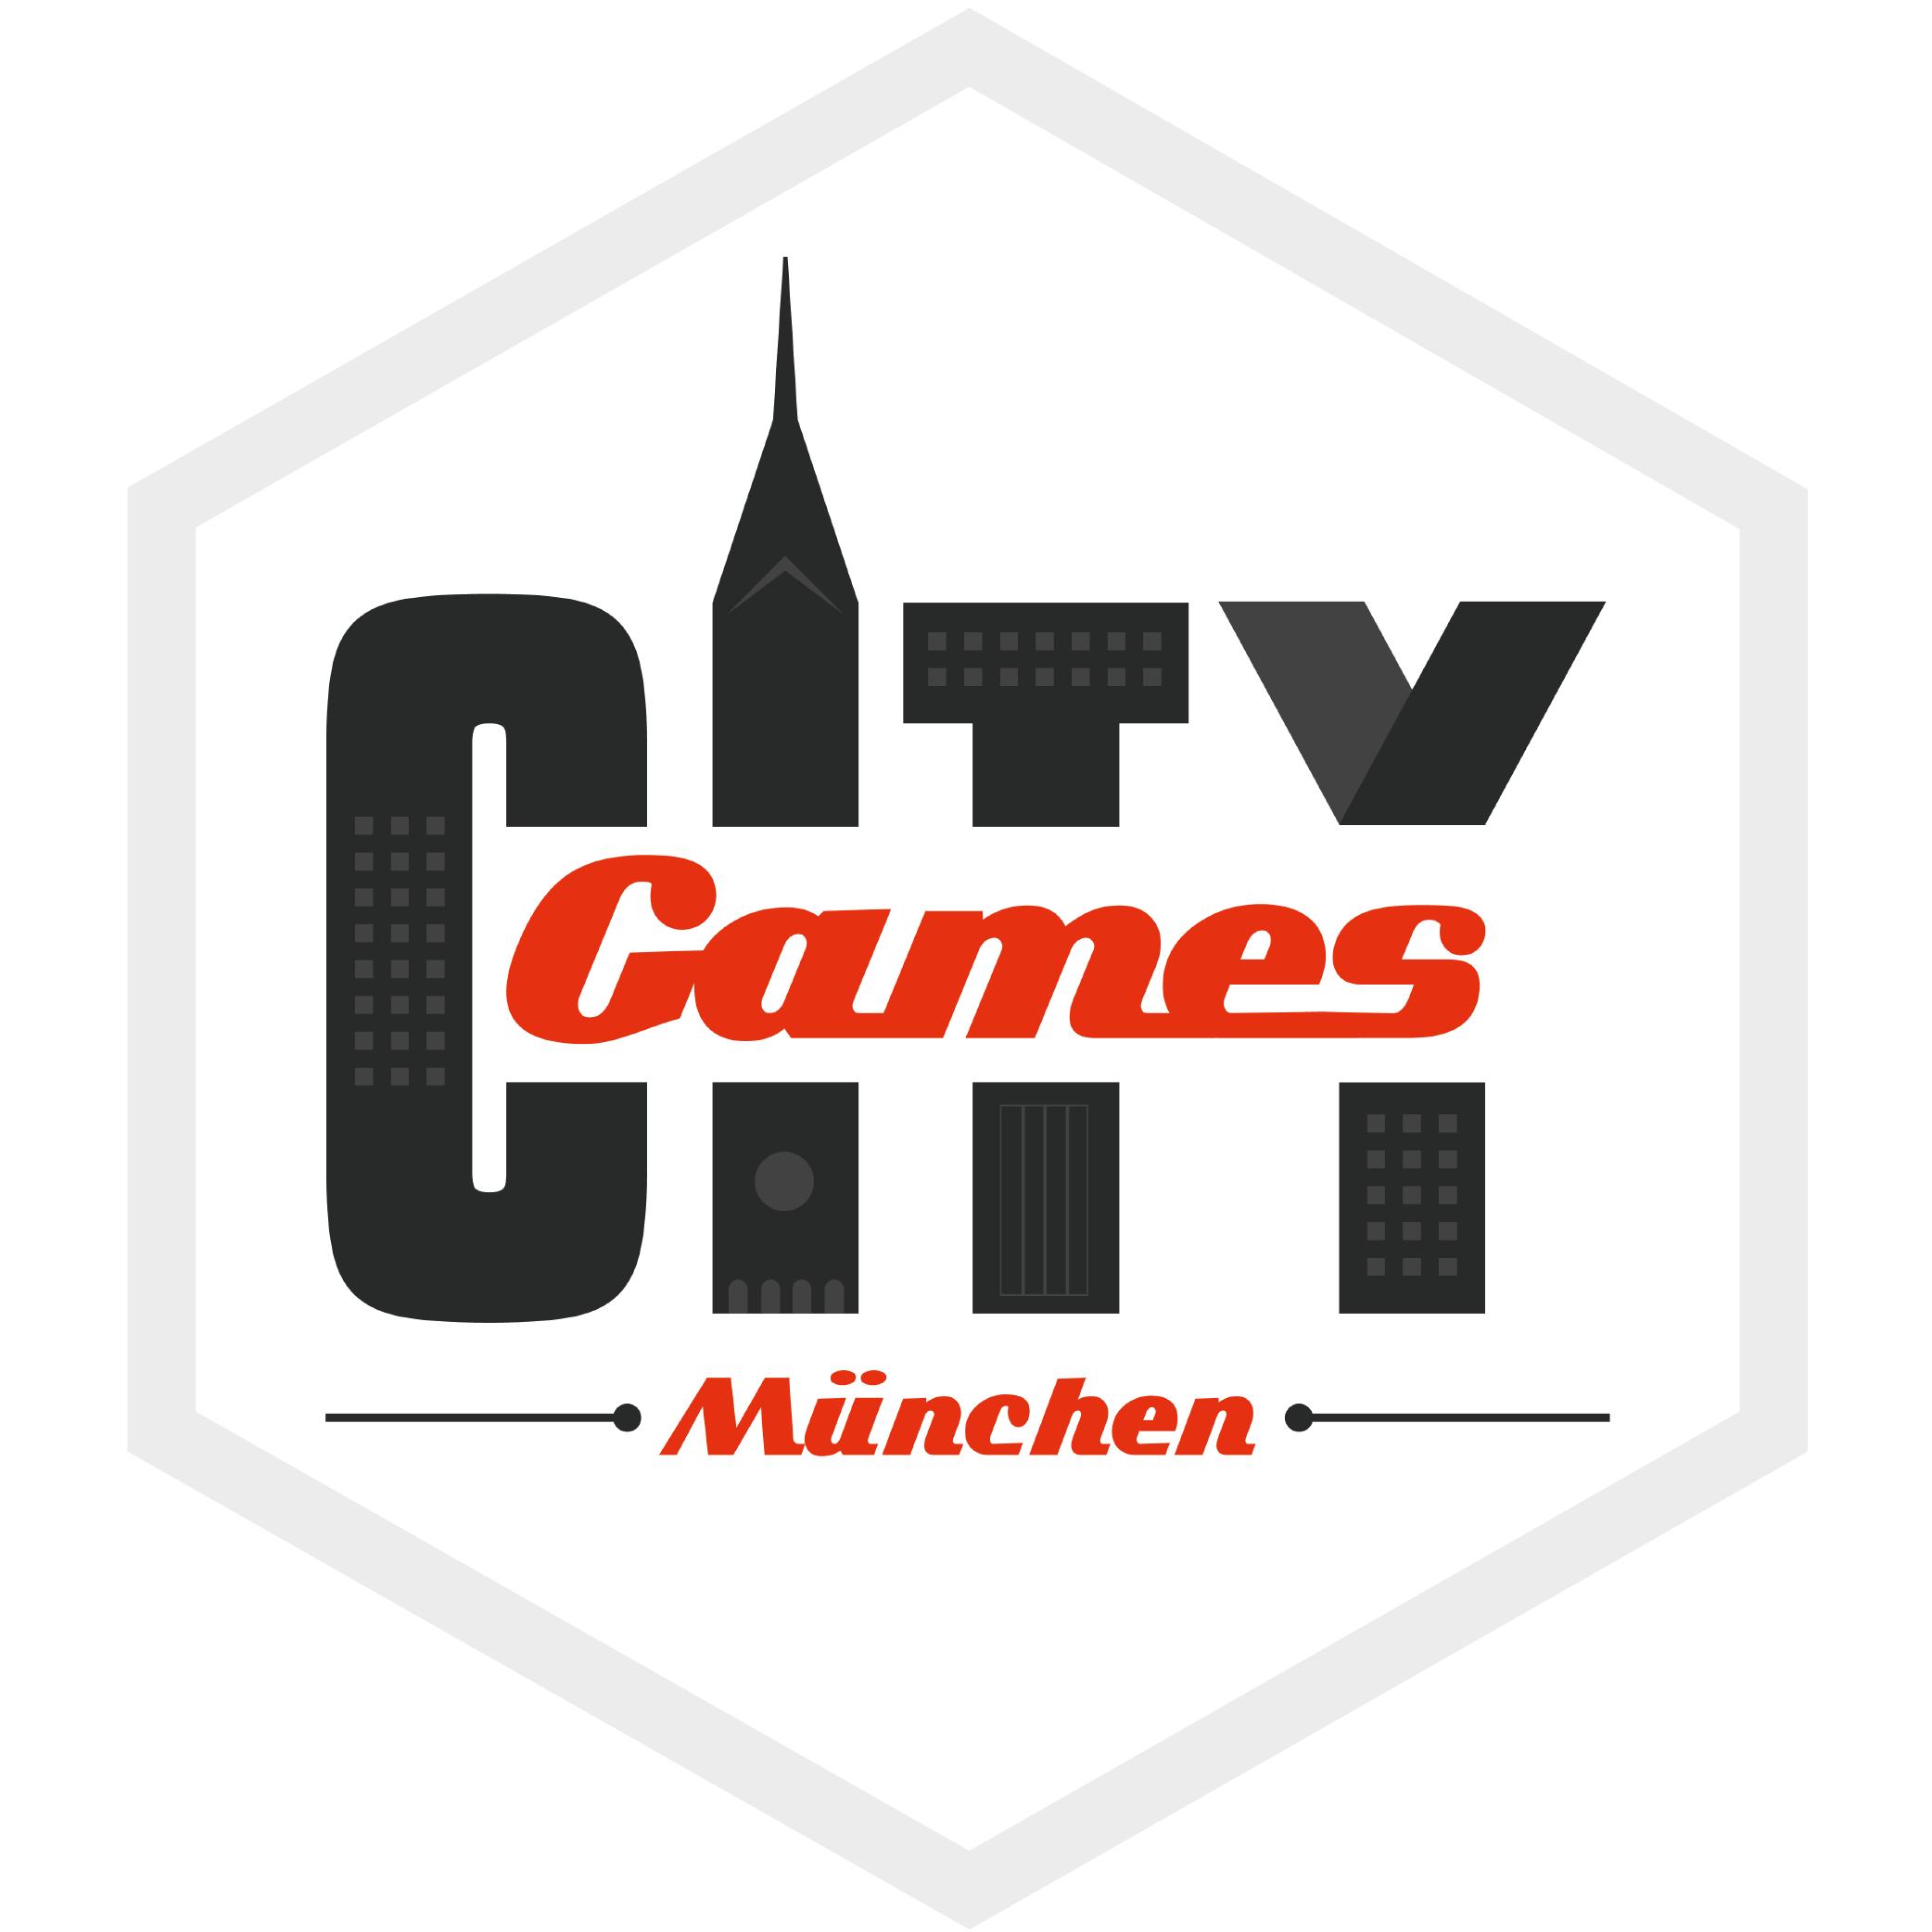 CityGames München